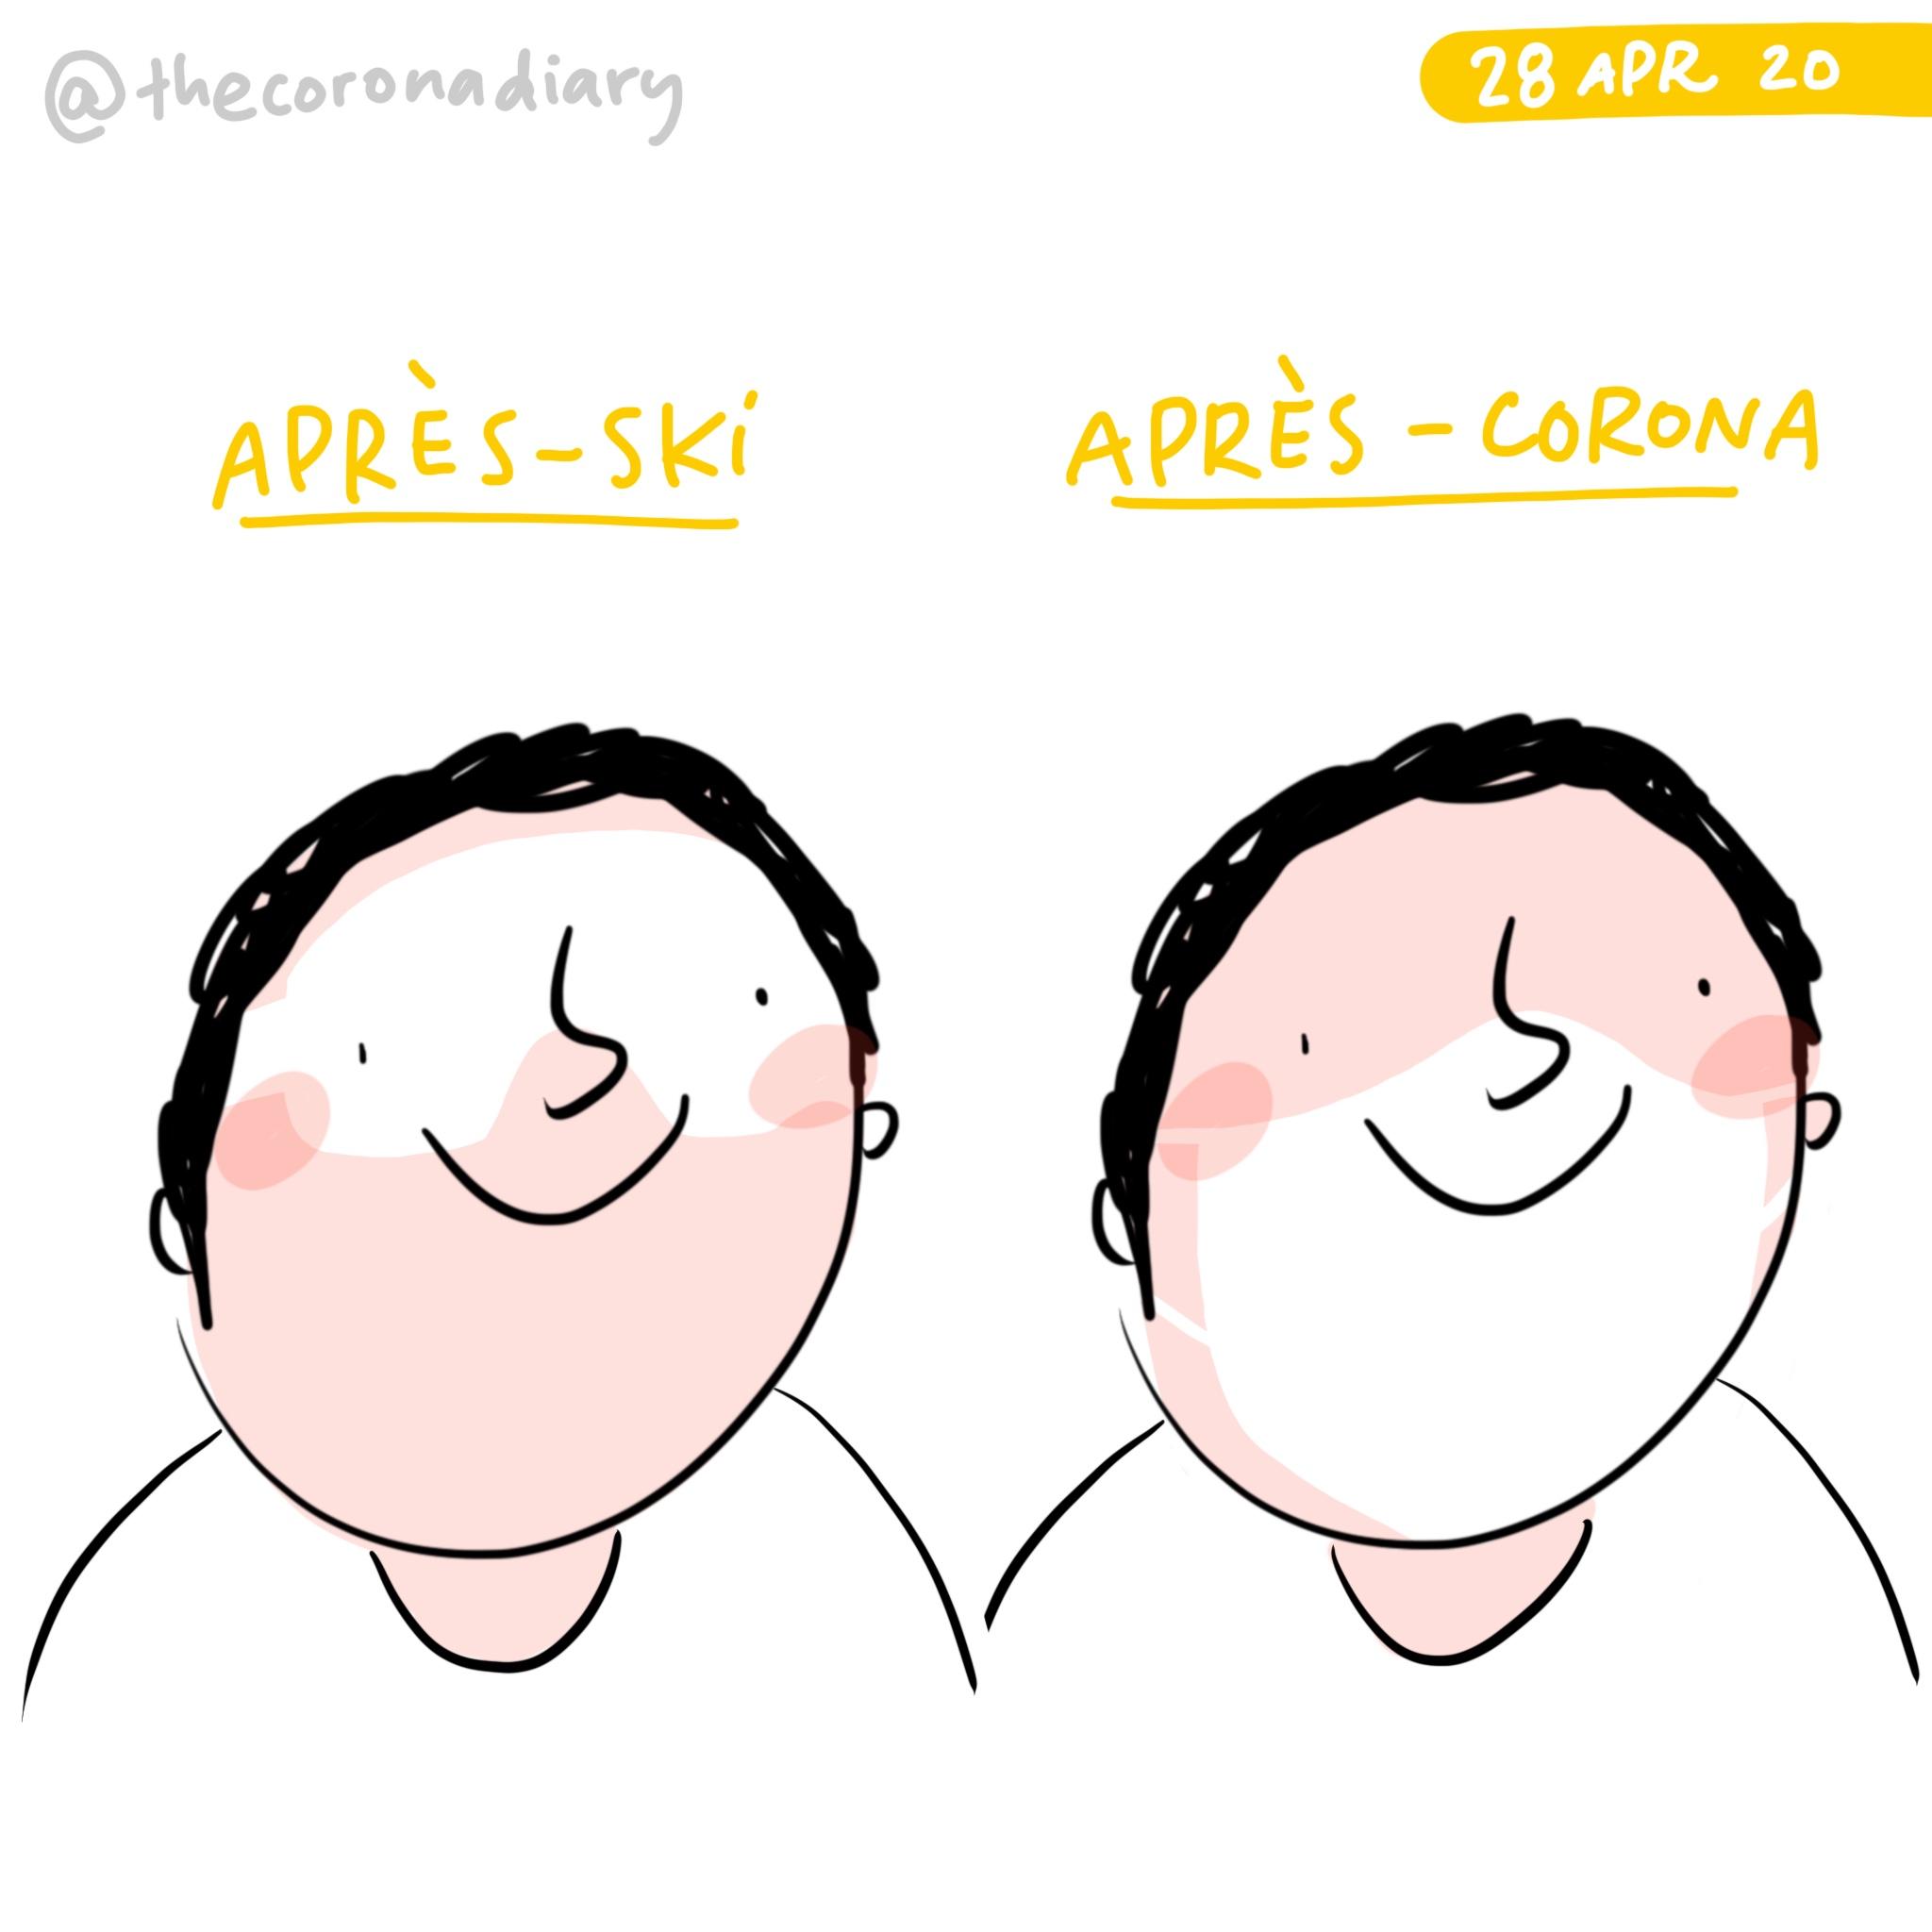 Apres-Ski / Apres-Corona